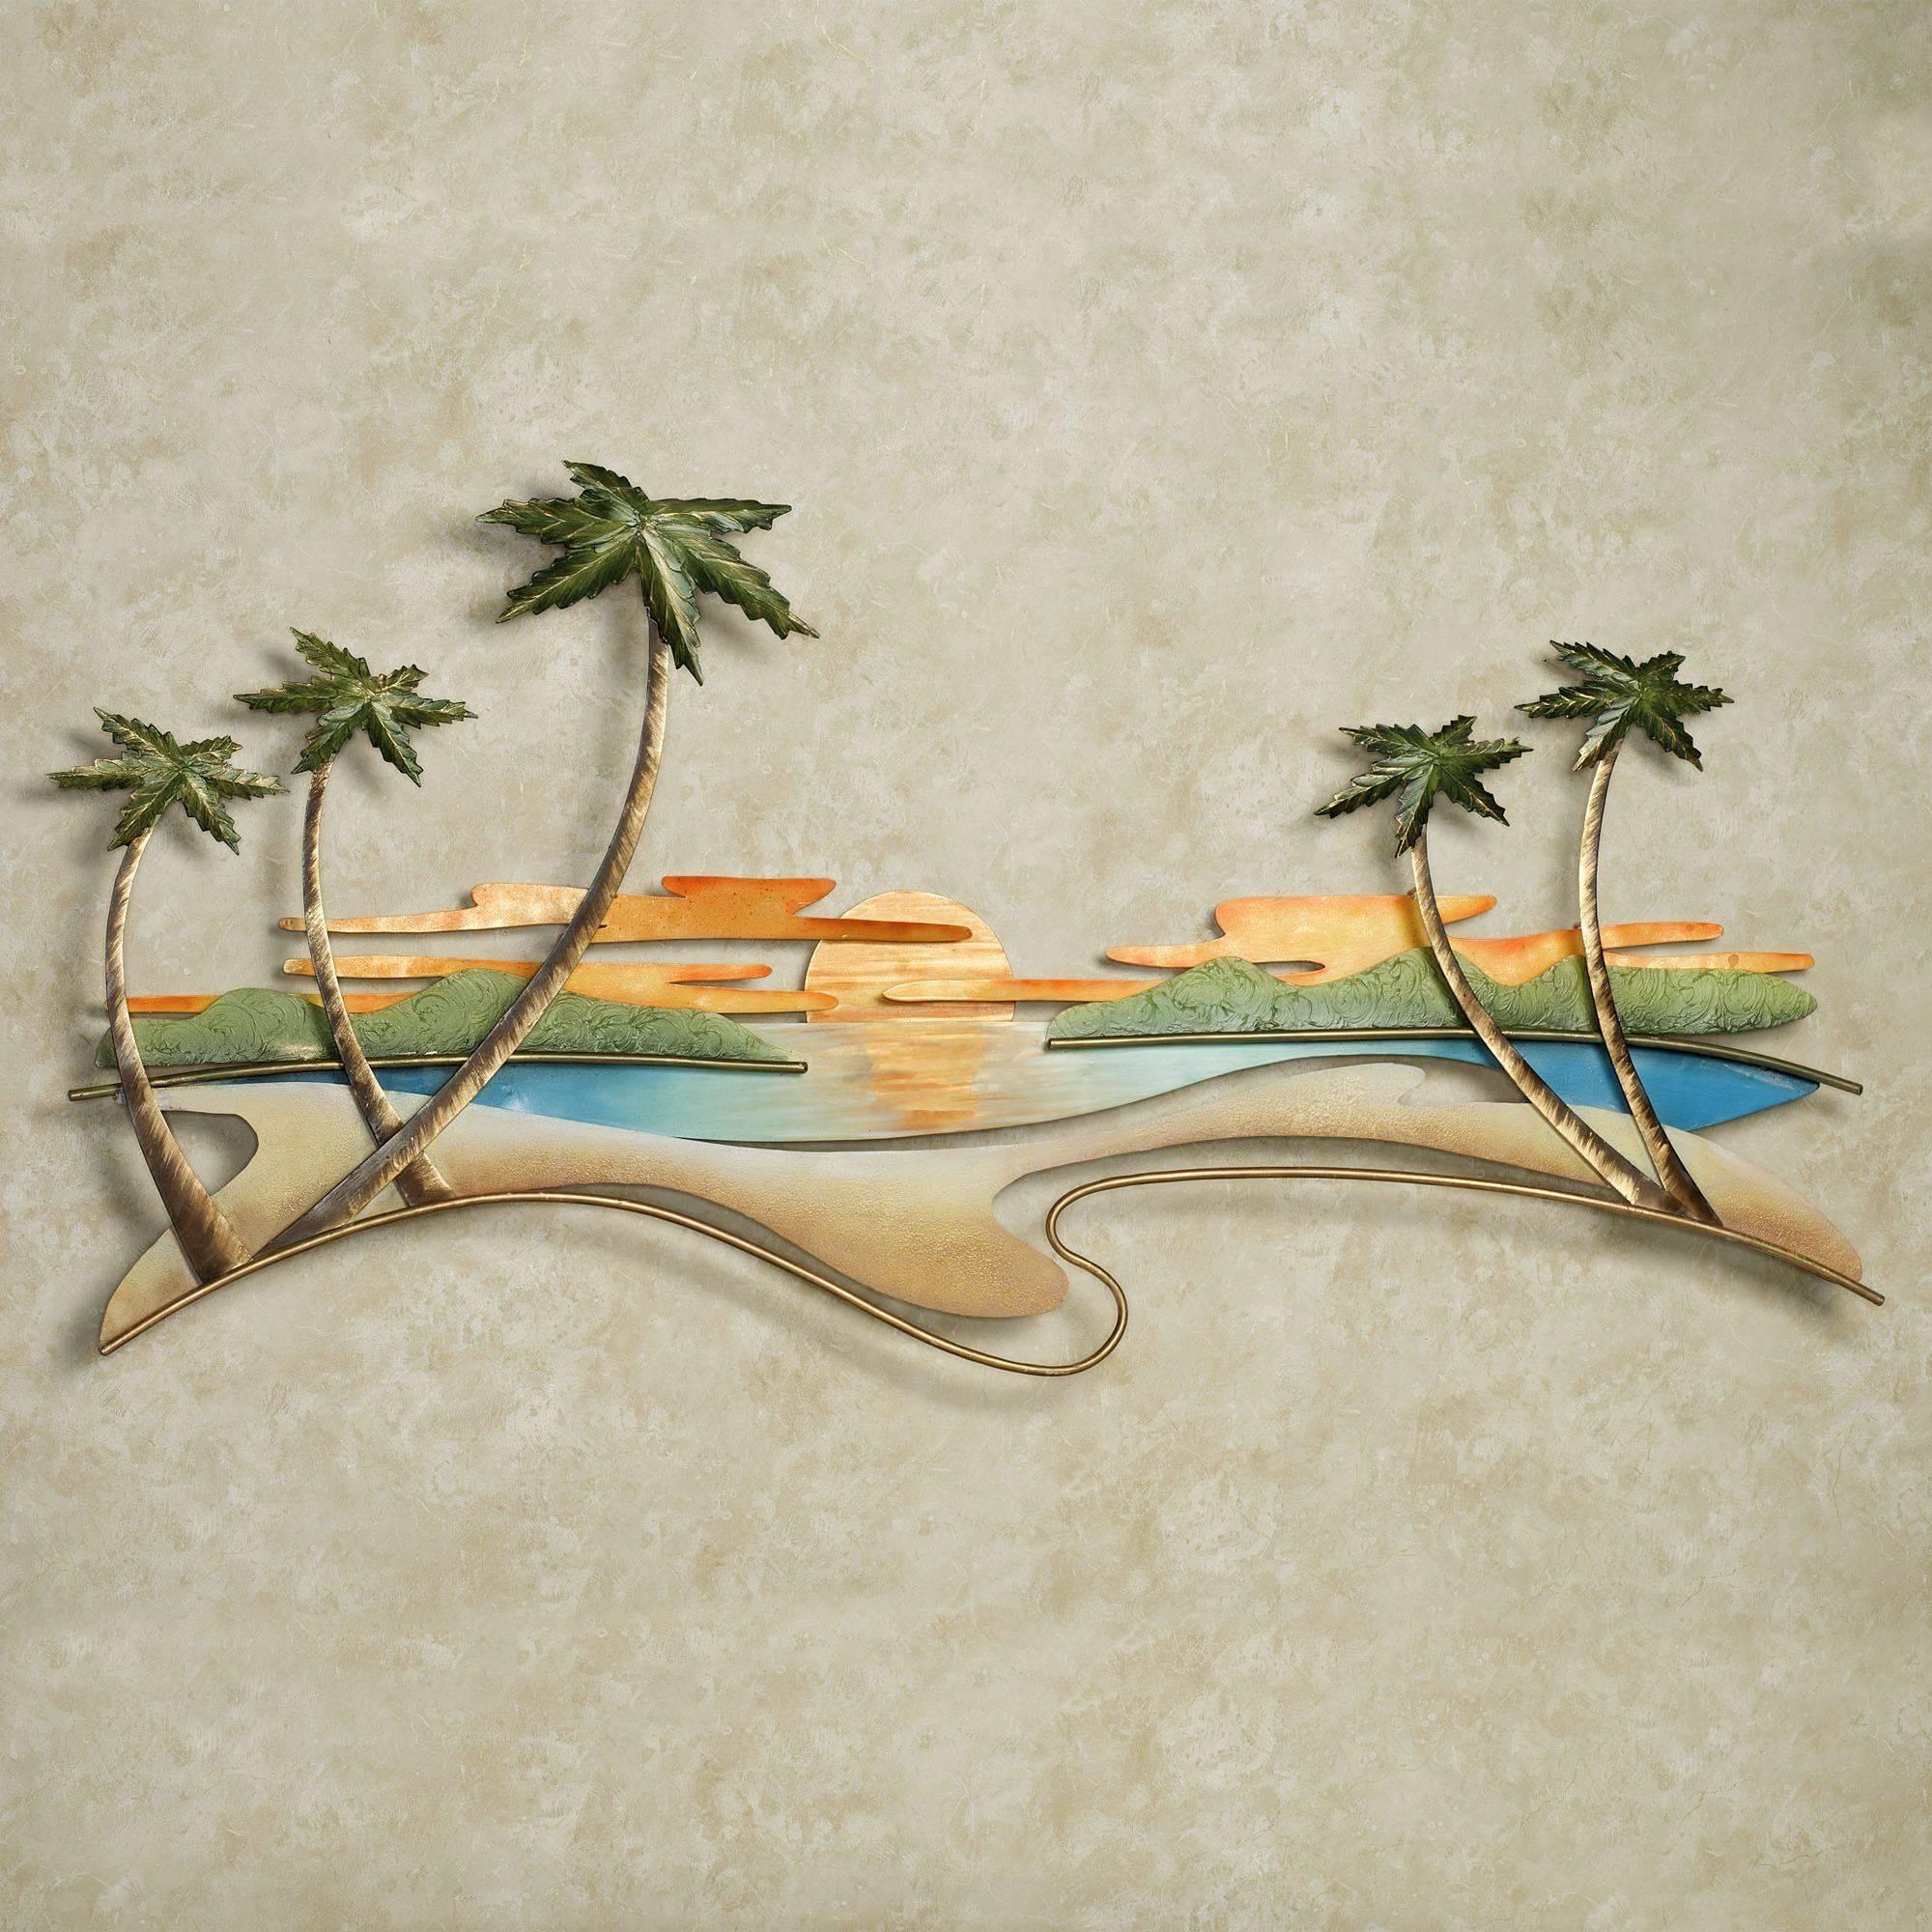 Caribbean Sunset Metal Wall Sculpturejasonw Studios Inside Most Popular Tropical Metal Wall Art (View 8 of 20)